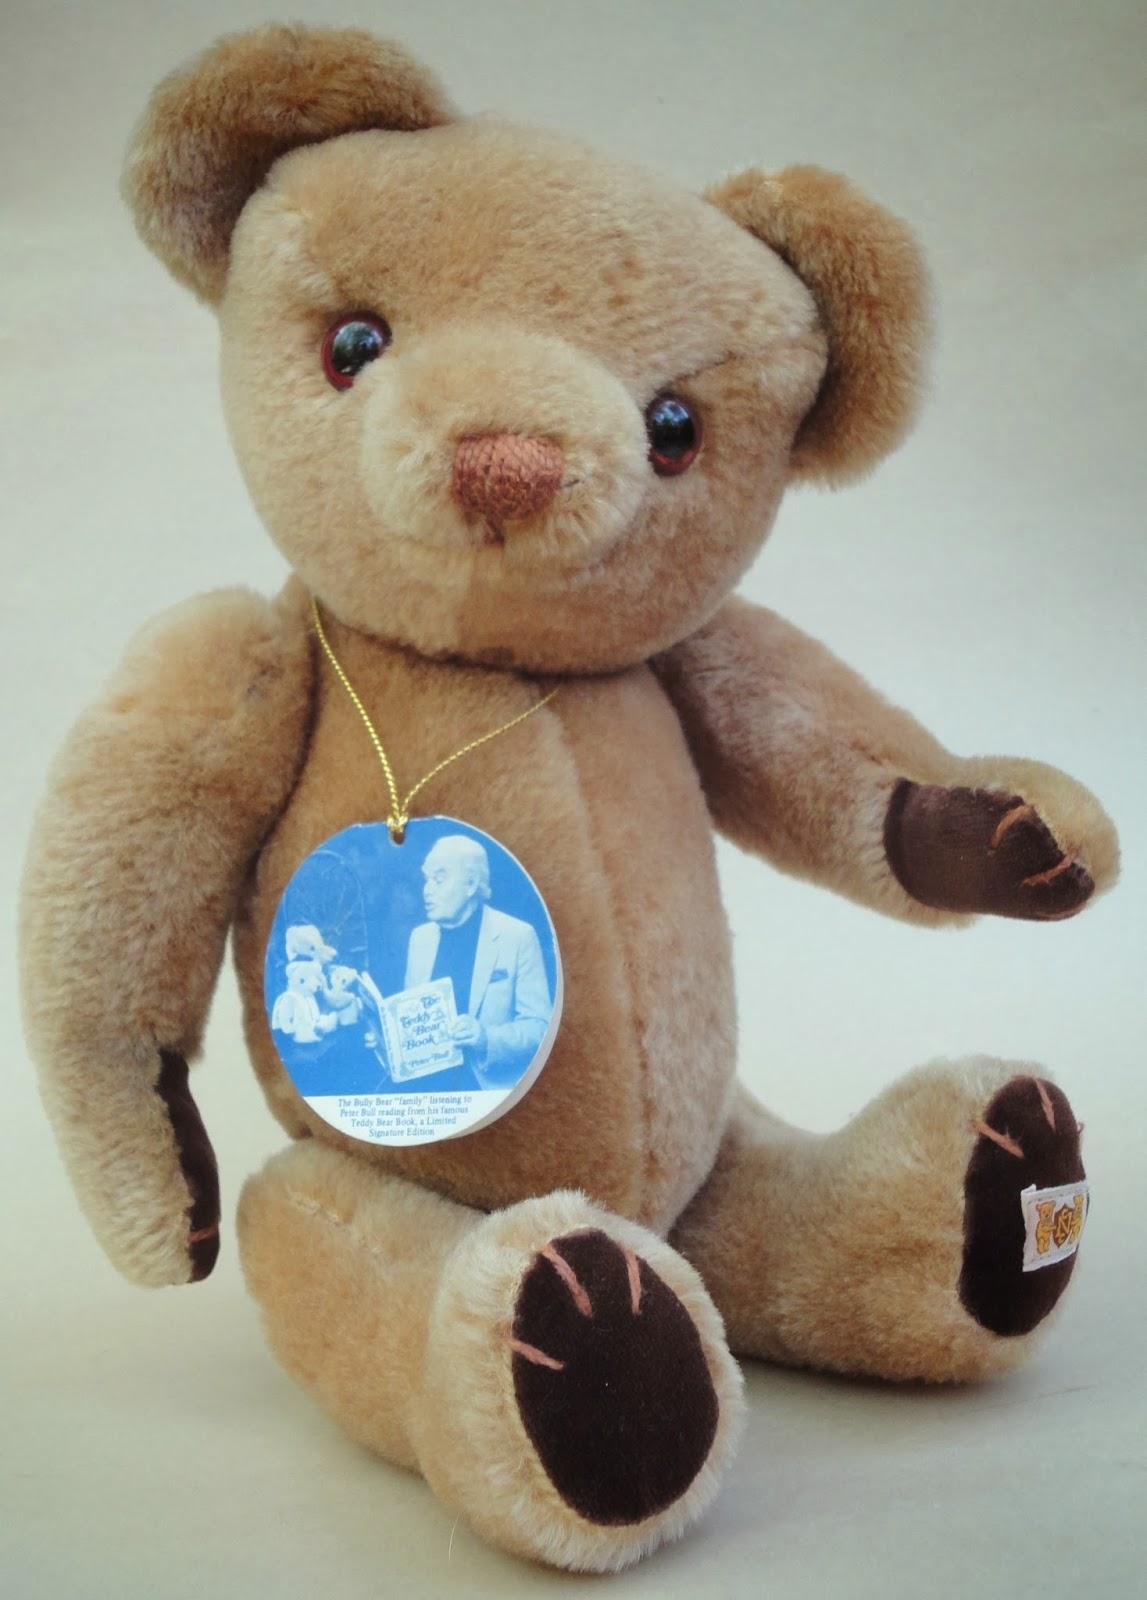 collectible teddy bears